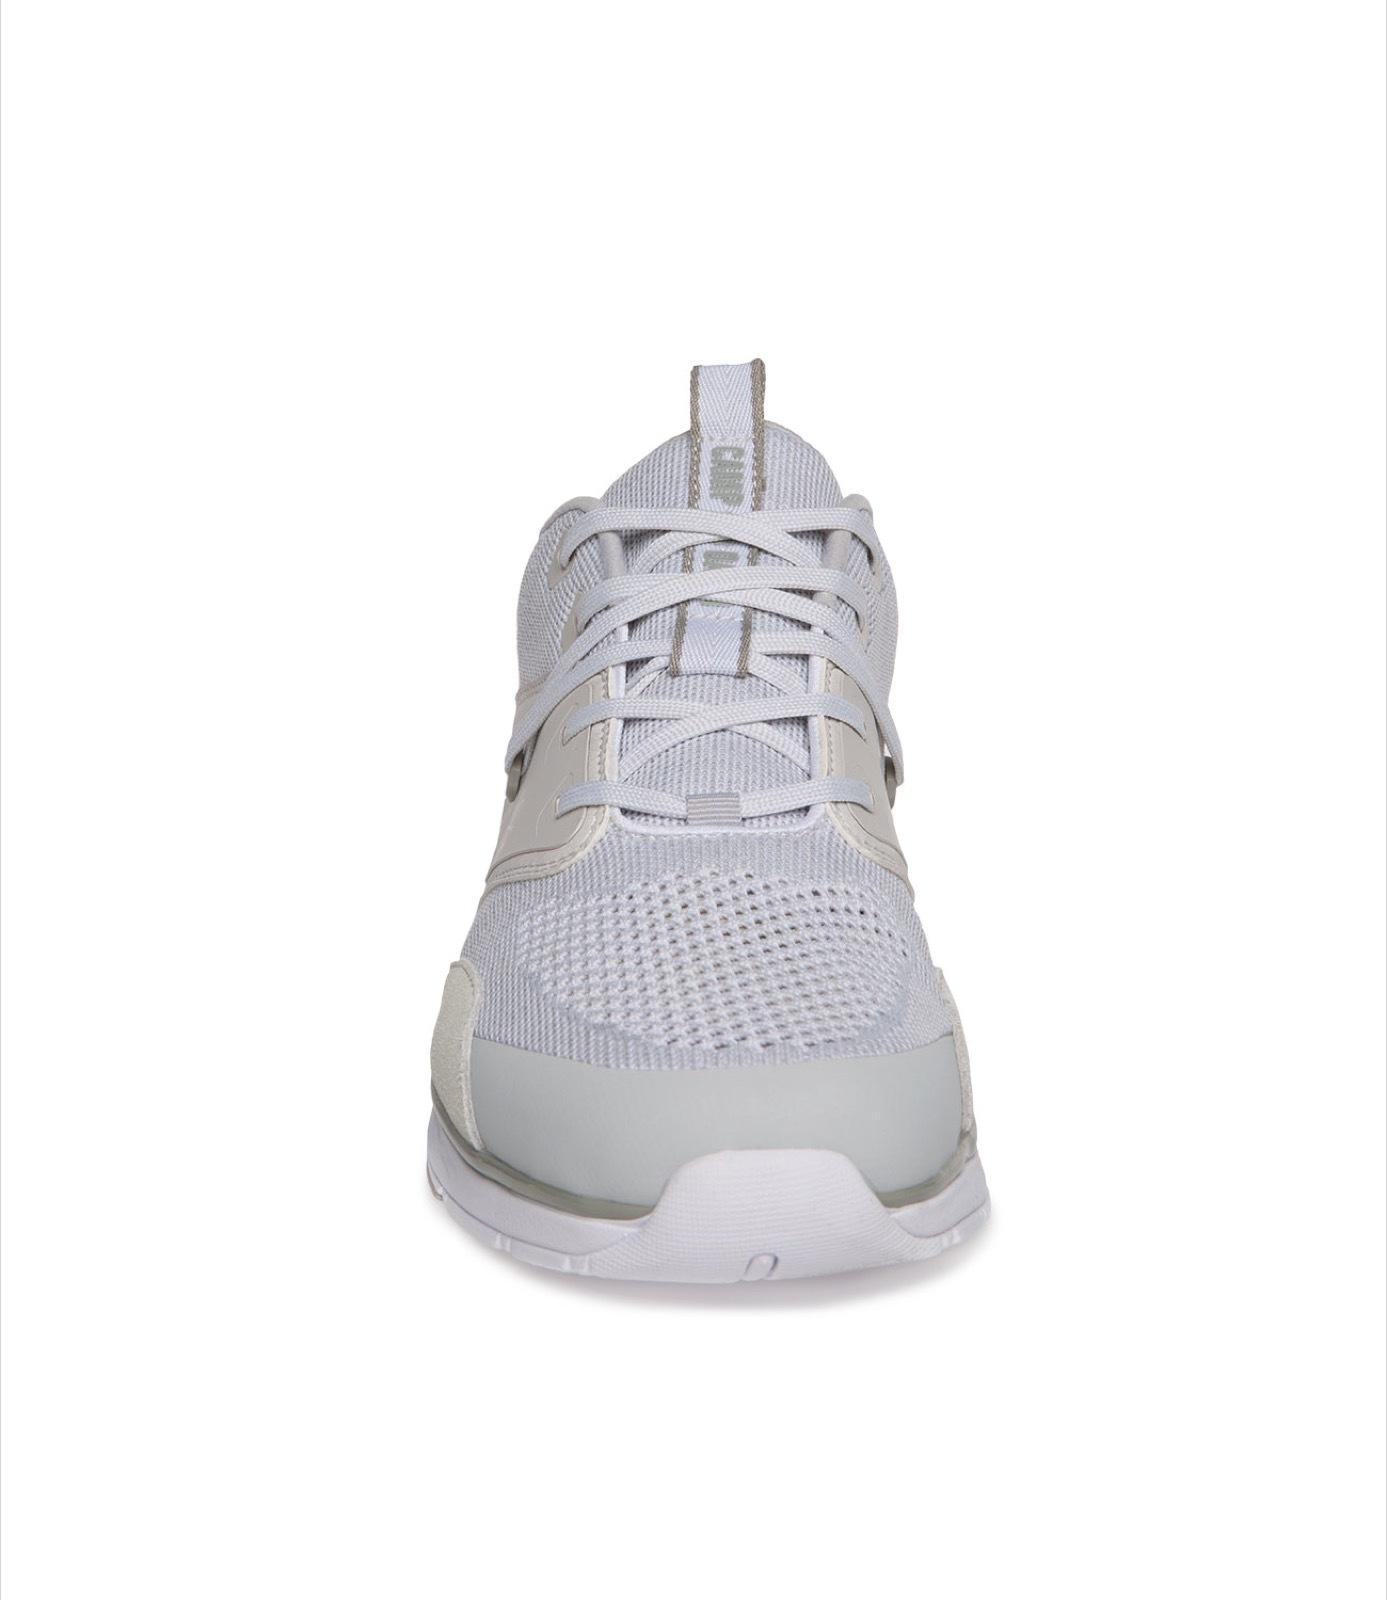 Atmungsaktiver Knit Sneaker, low